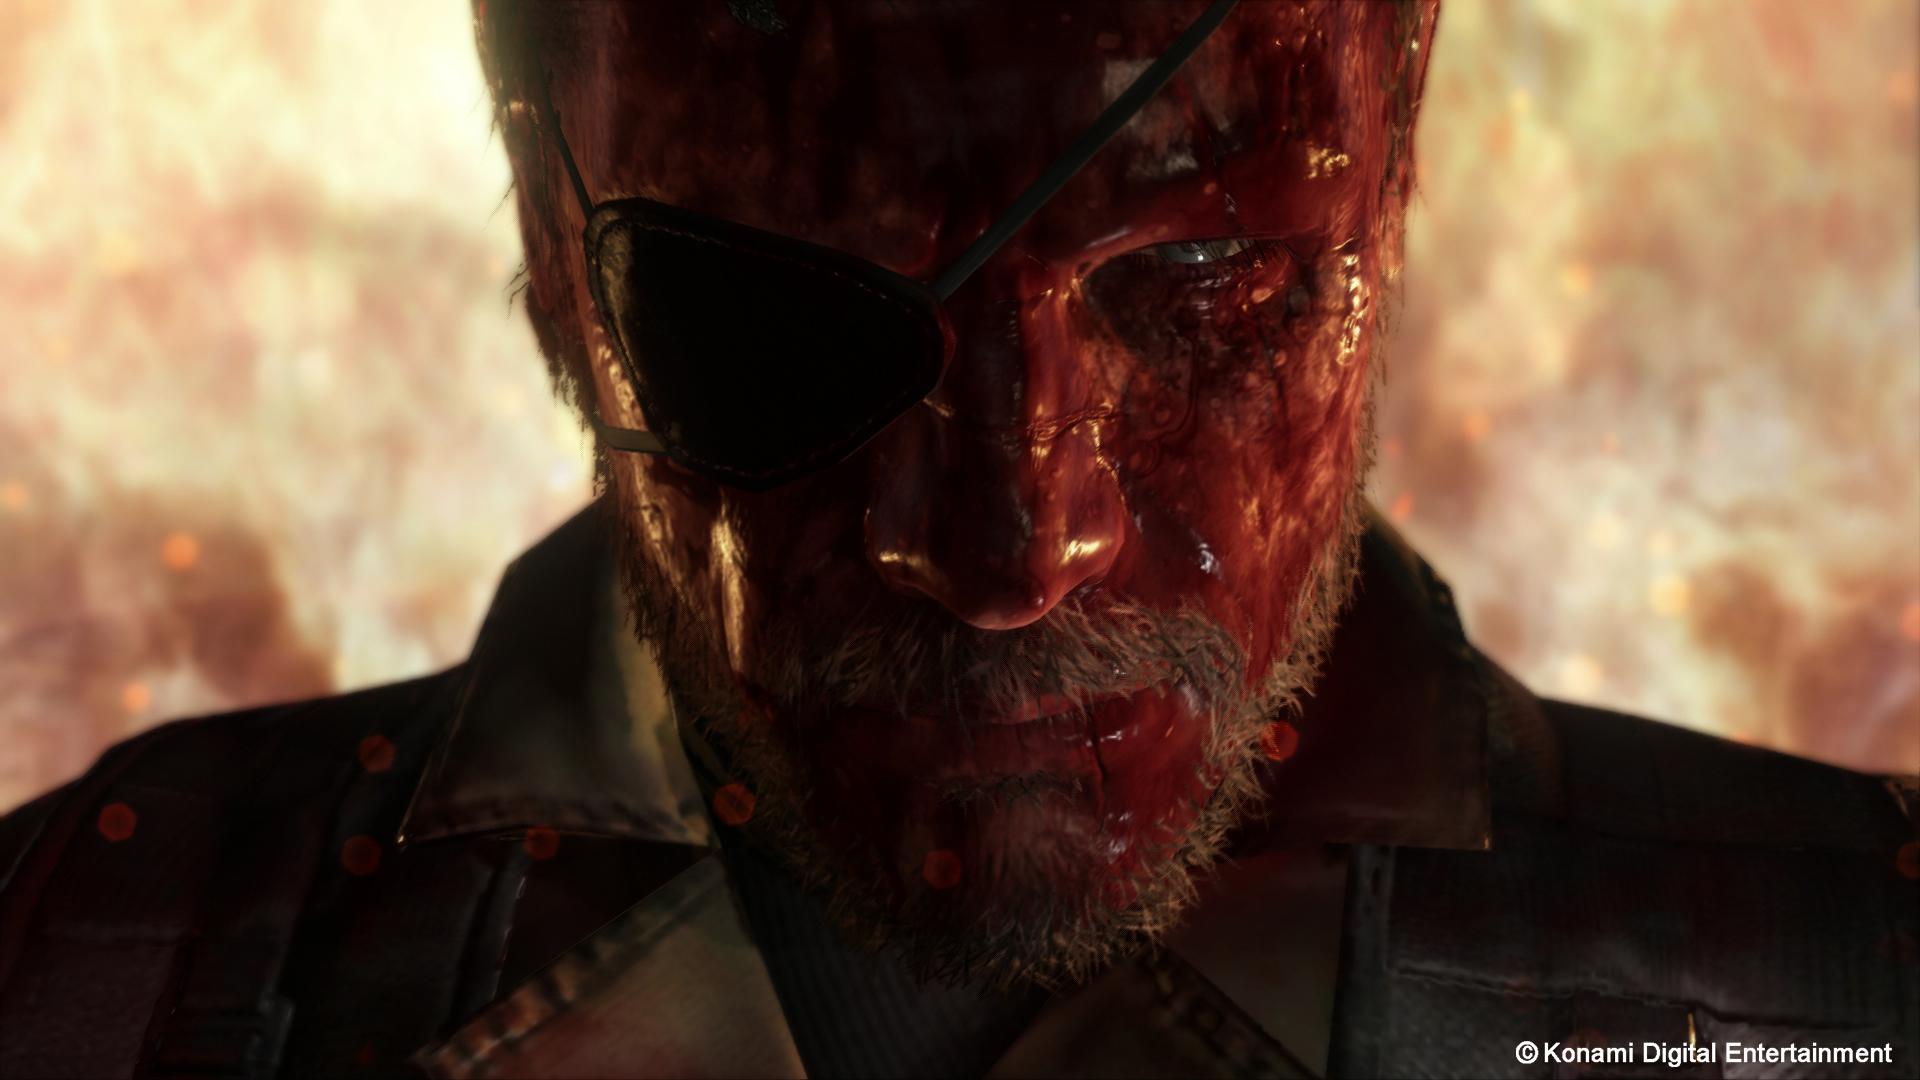 Metal Gear Solid V The Phantom Pain Hd Wallpaper Background